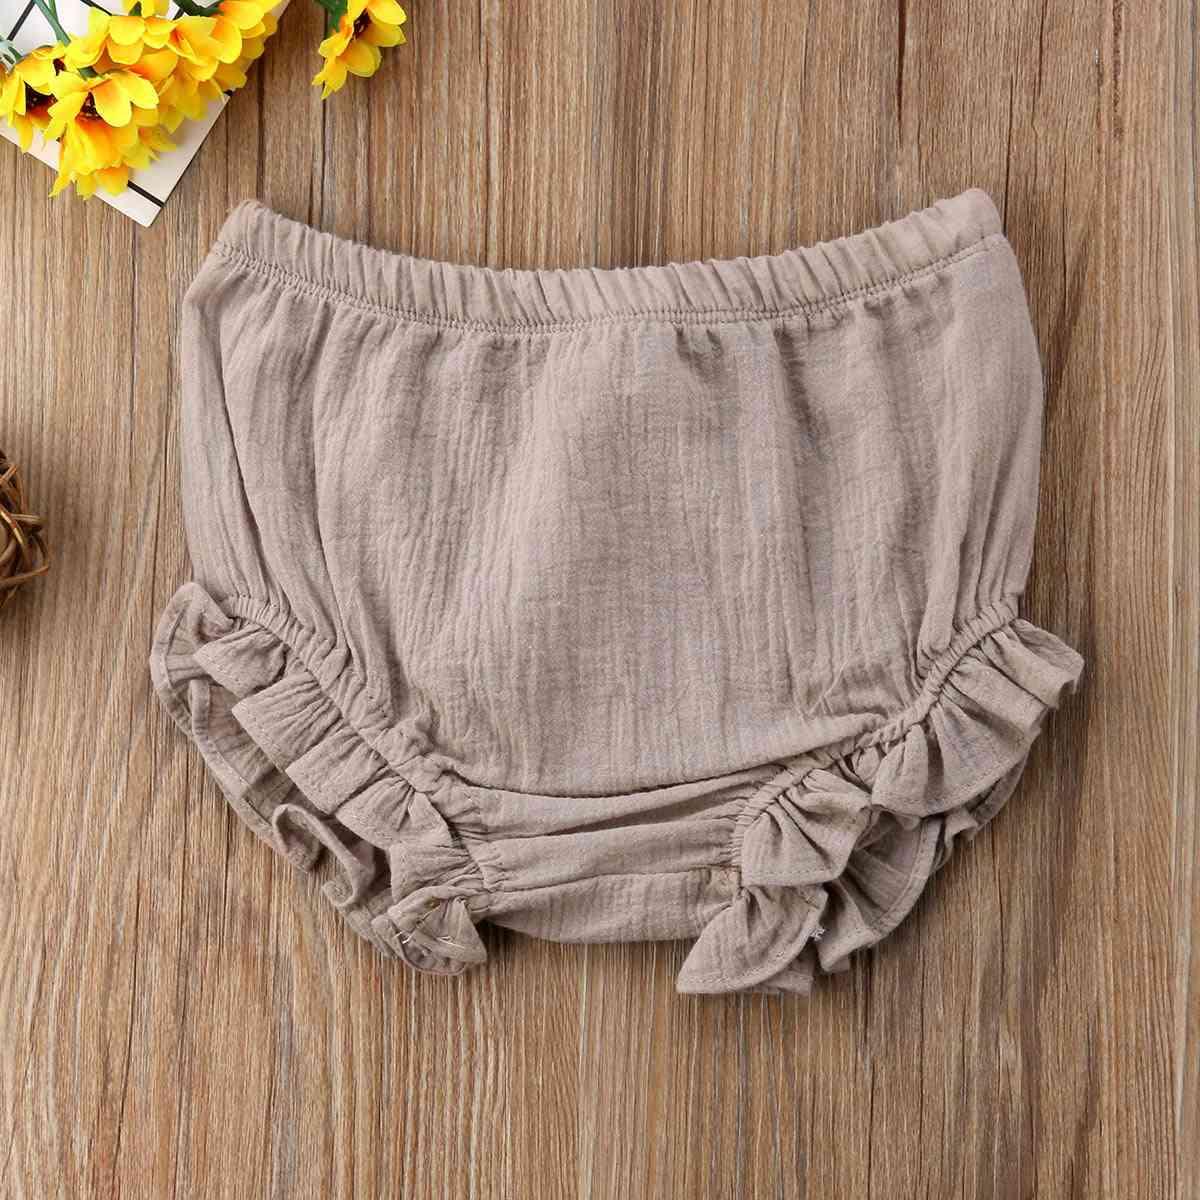 Infant Baby Boy Girl Ruffles Shorts, Cotton Nappy Diaper Covers Cute Panties